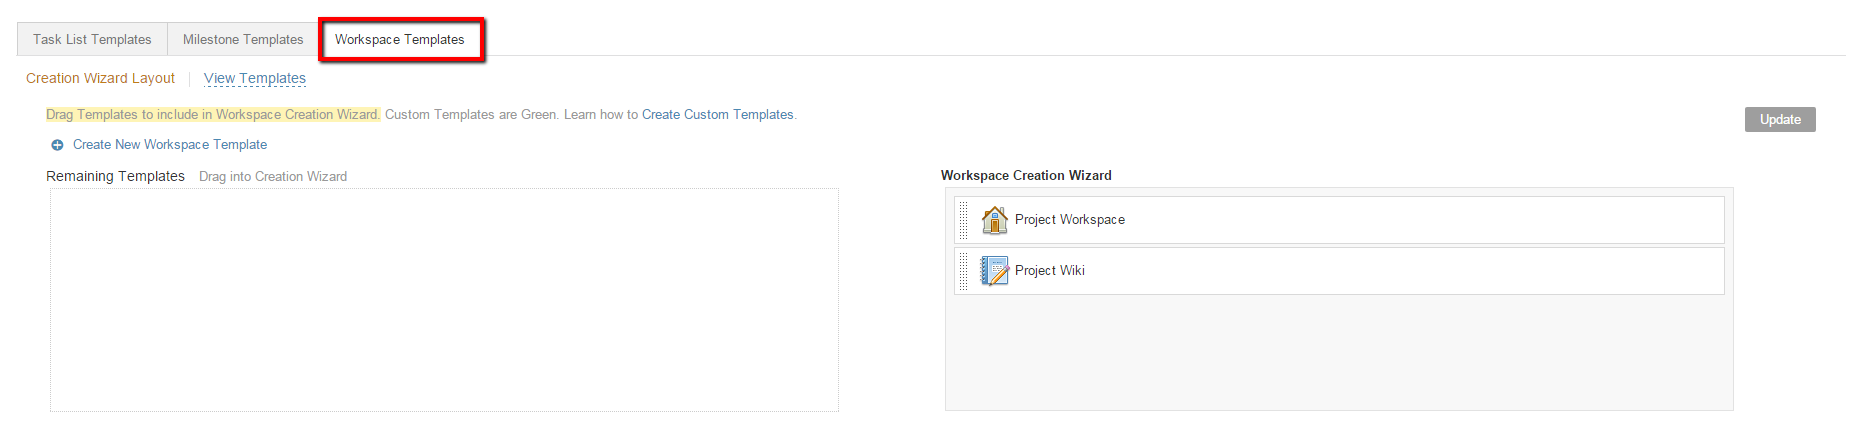 workspace templates imeet central help center